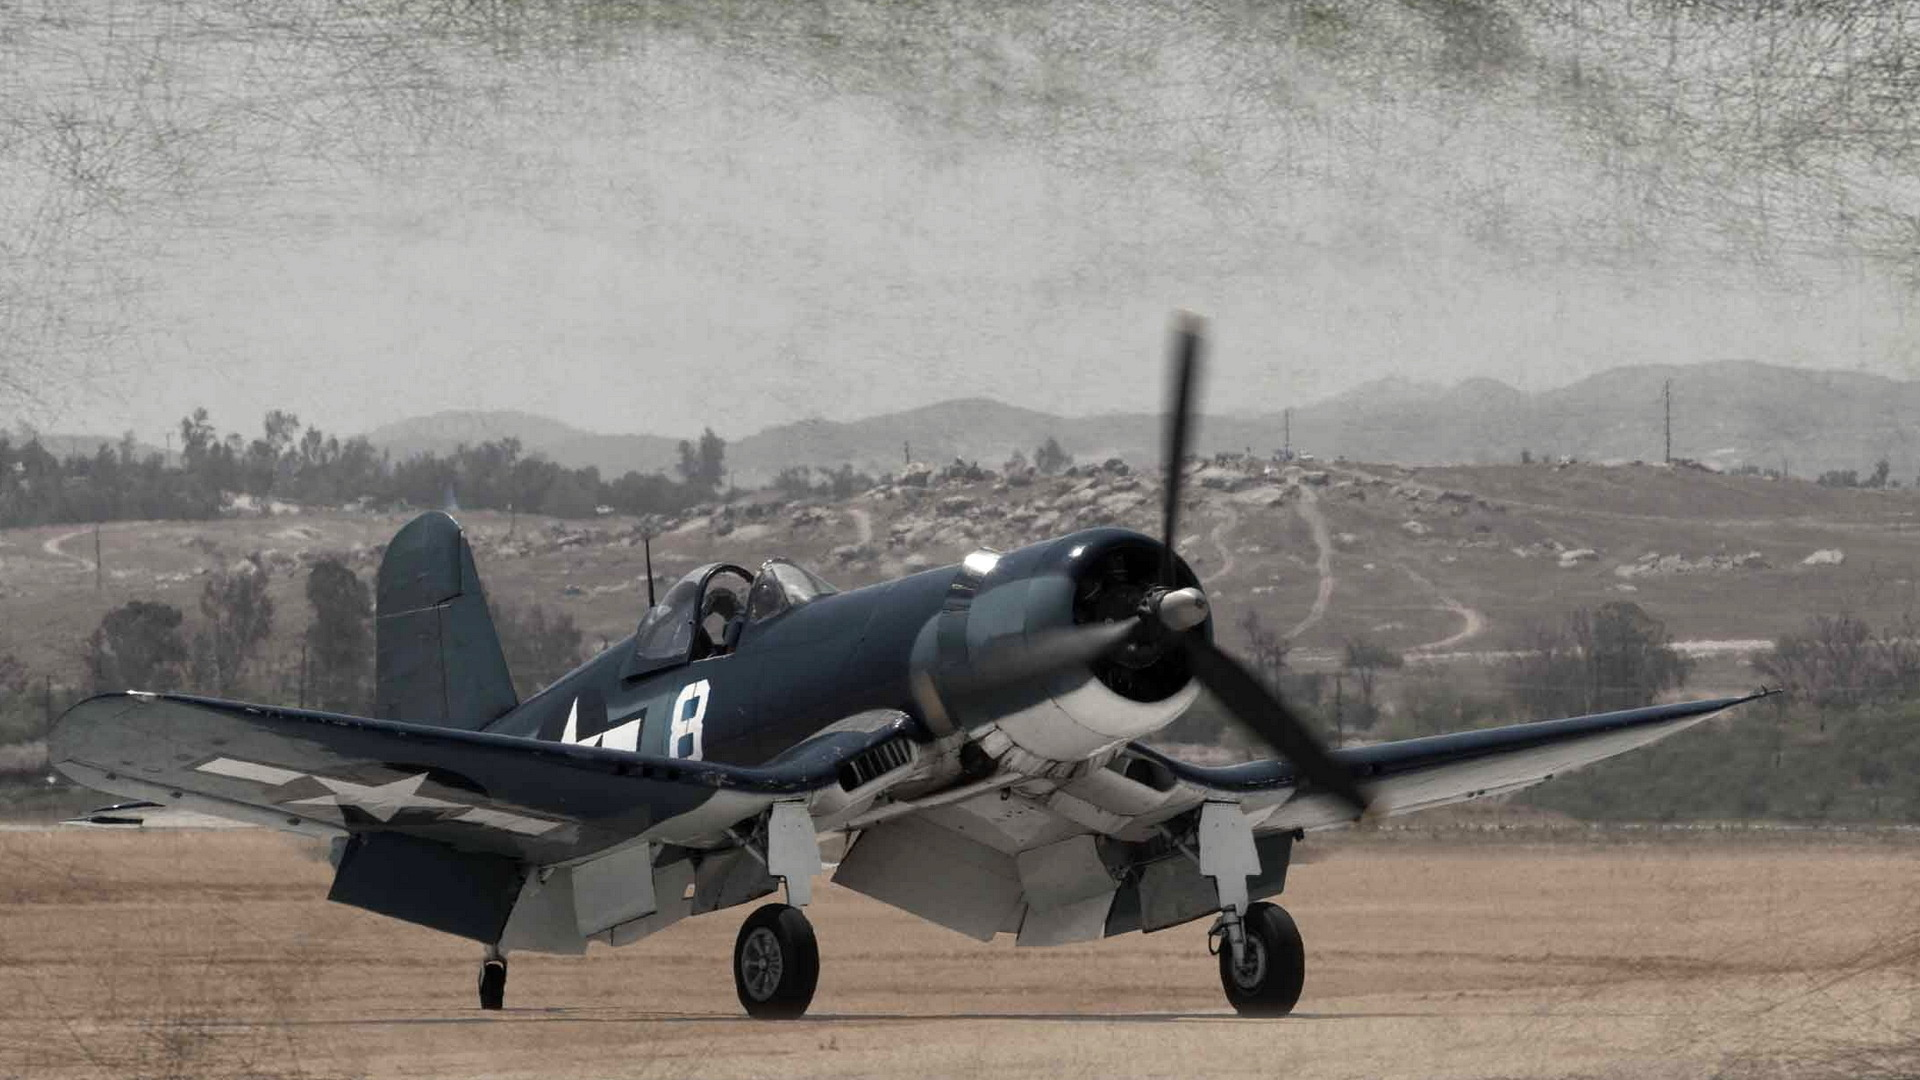 Vought F4U Corsair Fond d'écran HD | Arrière-Plan | 1920x1080 | ID:392112 - Wallpaper Abyss